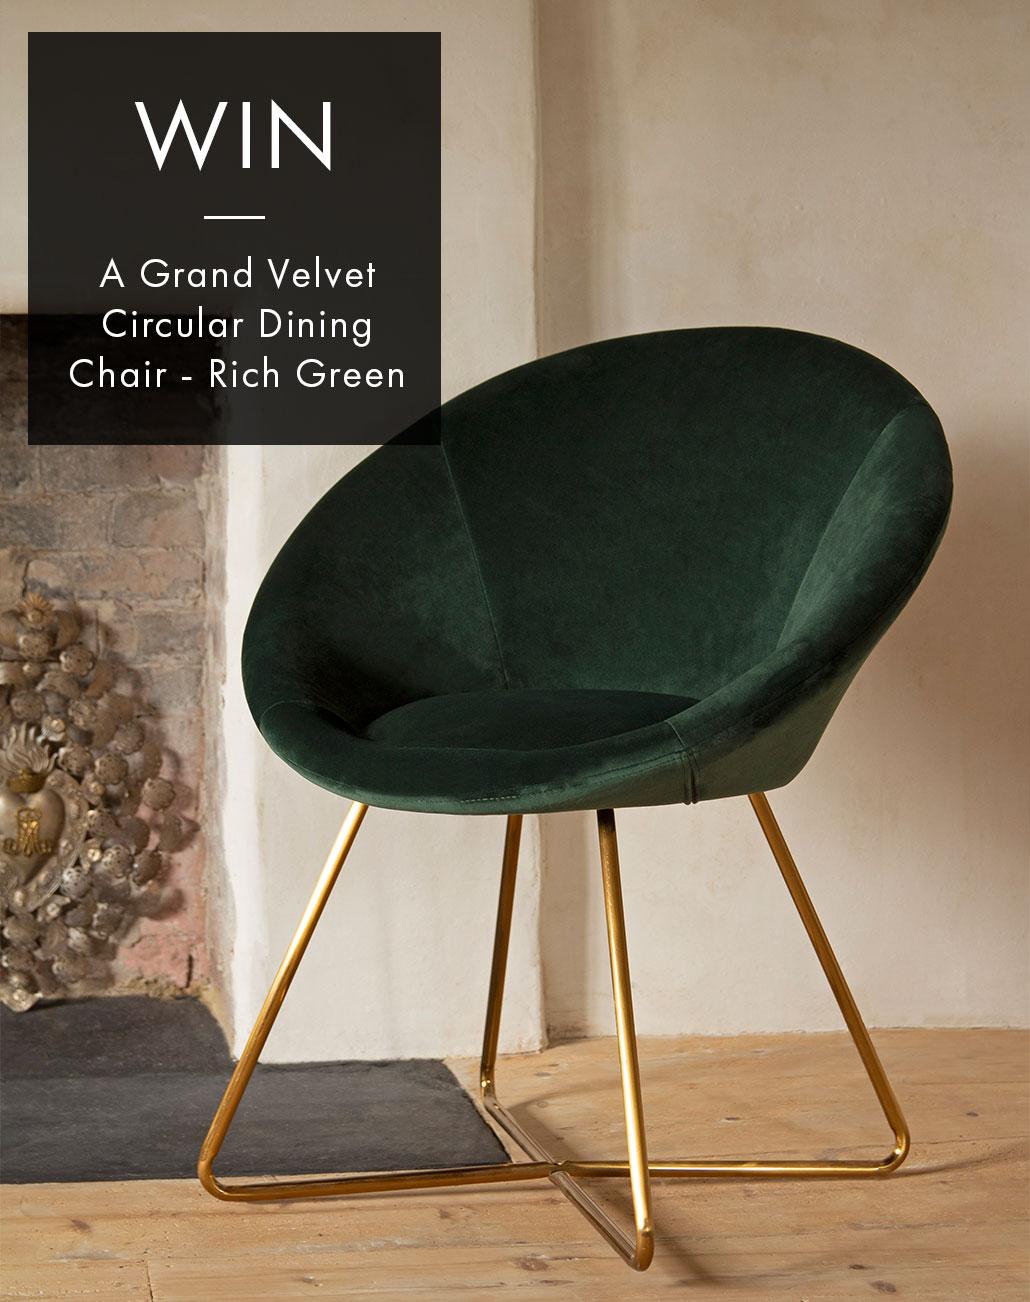 WIN: 1 x The Grand Circular Velvet Dining Chair - Rich Green